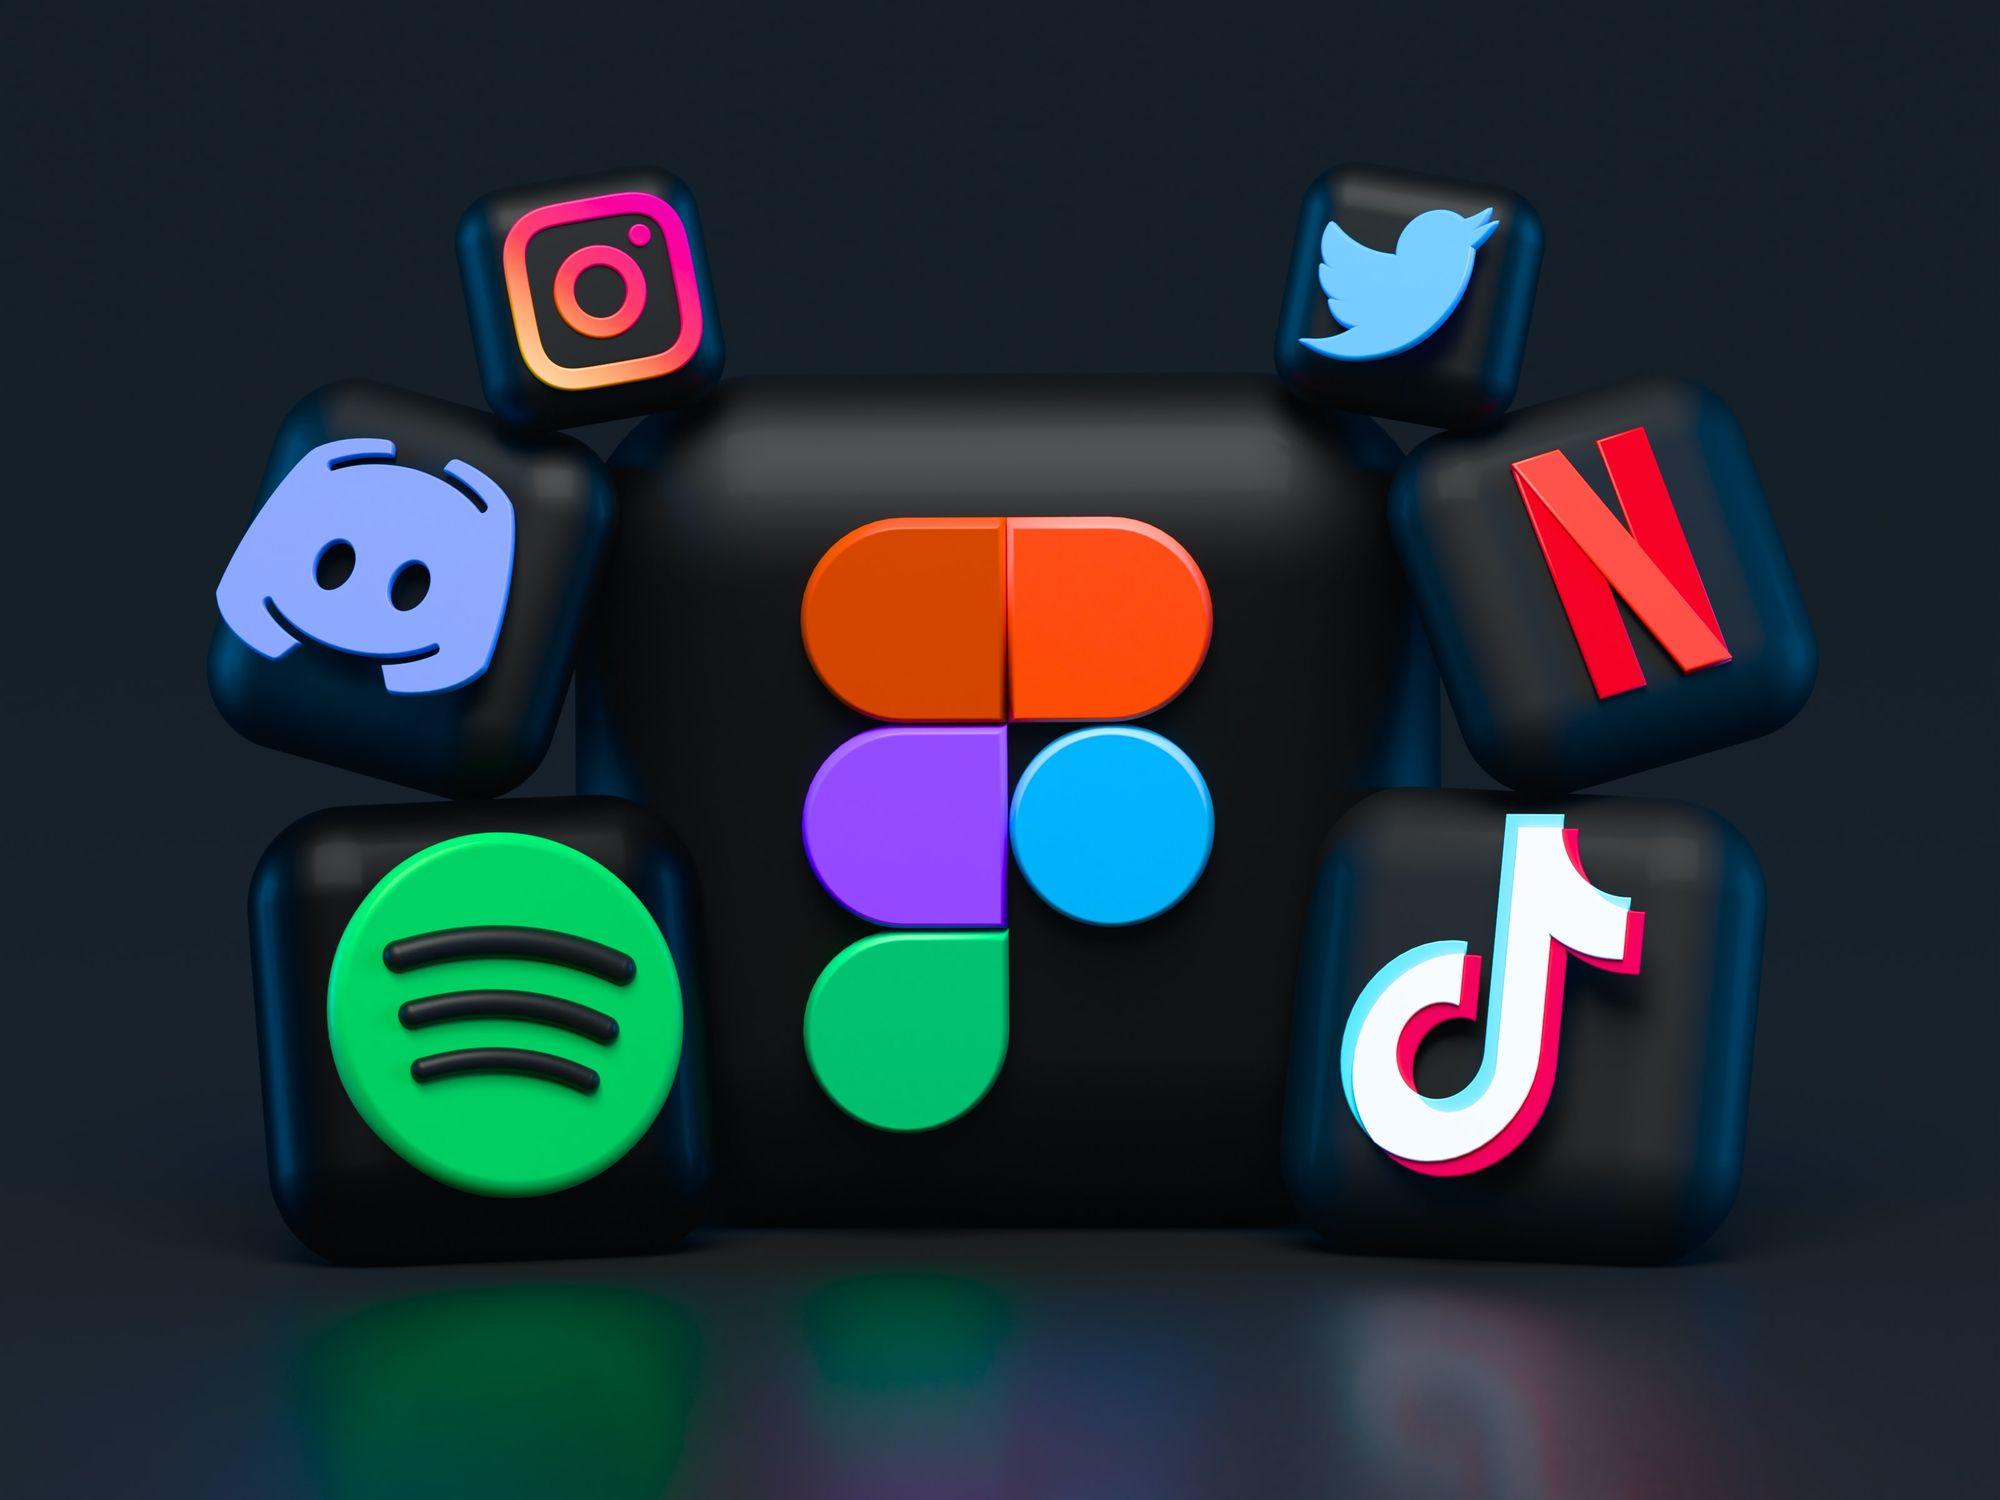 A dark frame containing icons for Spotify, Discord, Instagram, Twitter, Netflix, TikTok, etc.